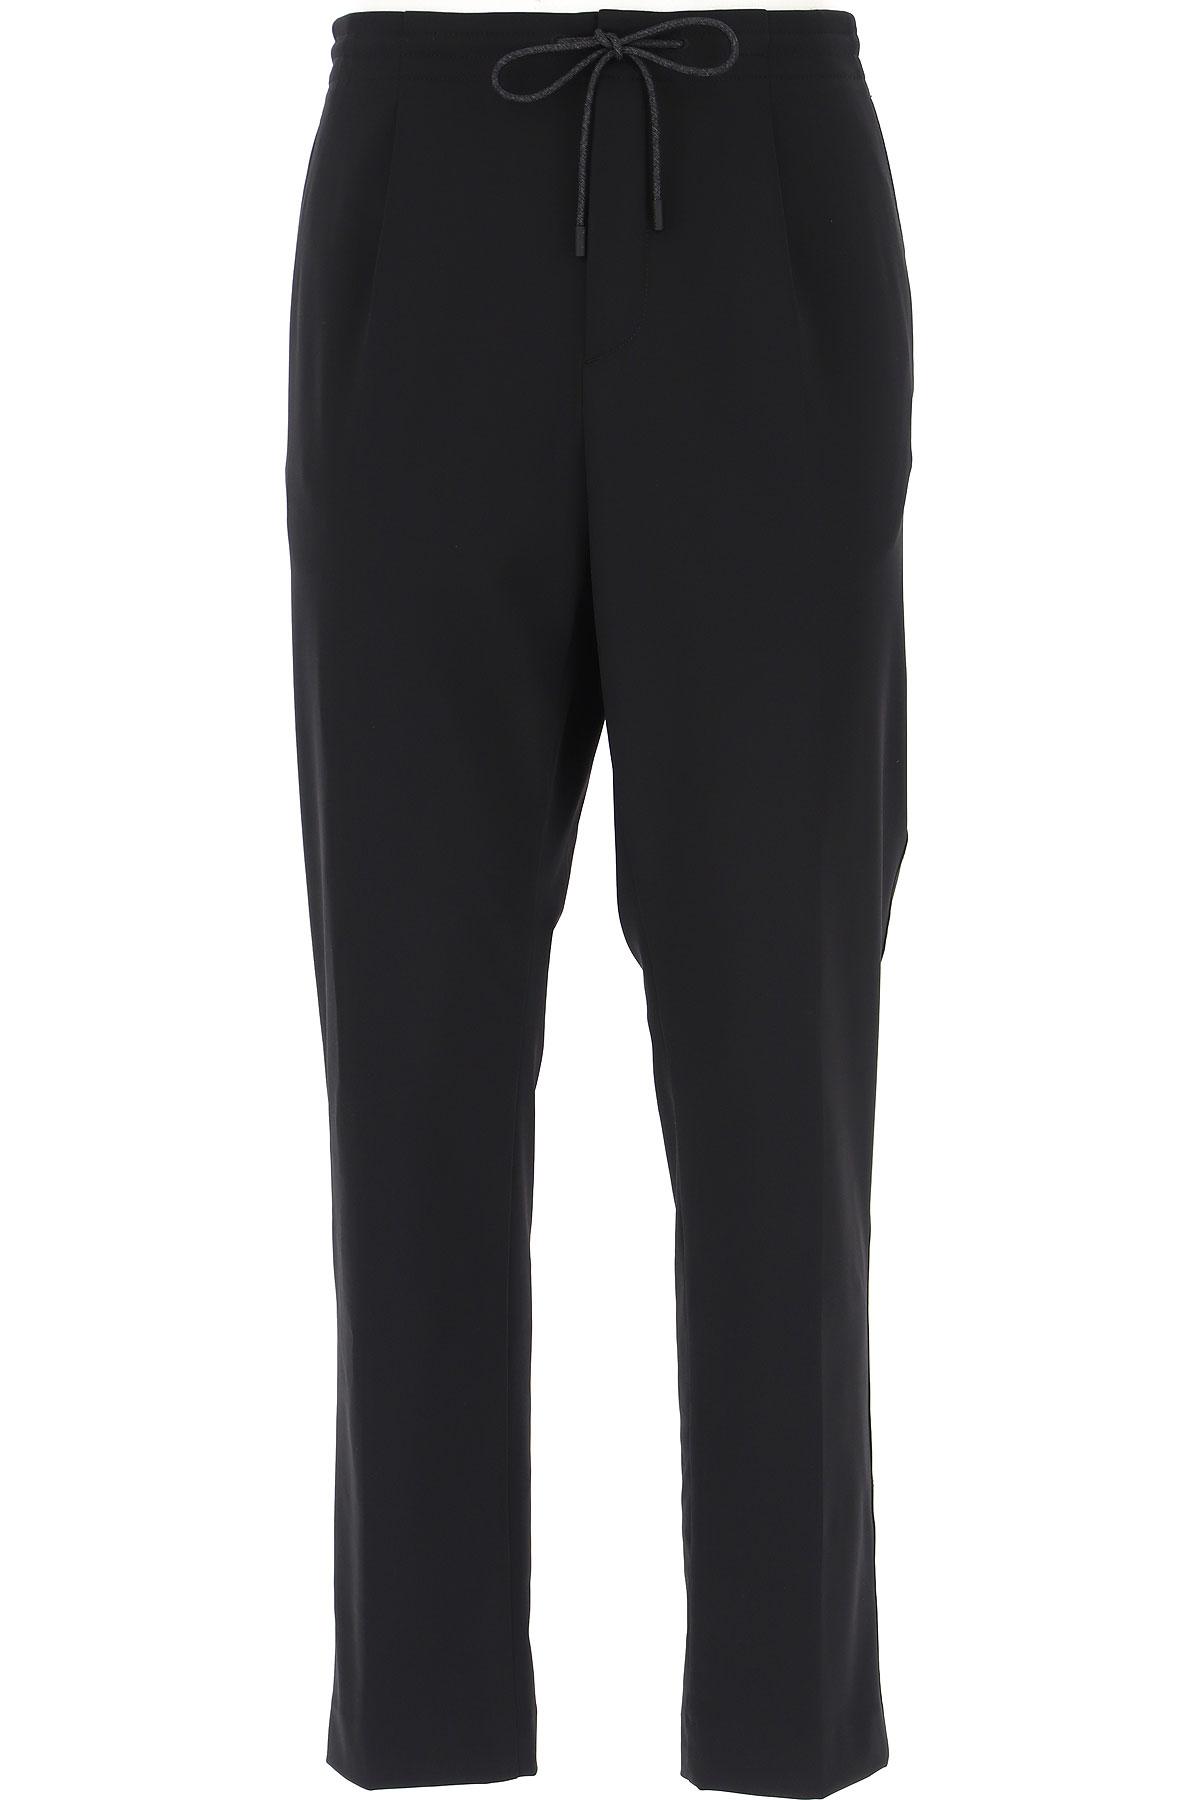 Ermenegildo Zegna Pants For Men, Black, Polyamide, 2021, 30 34